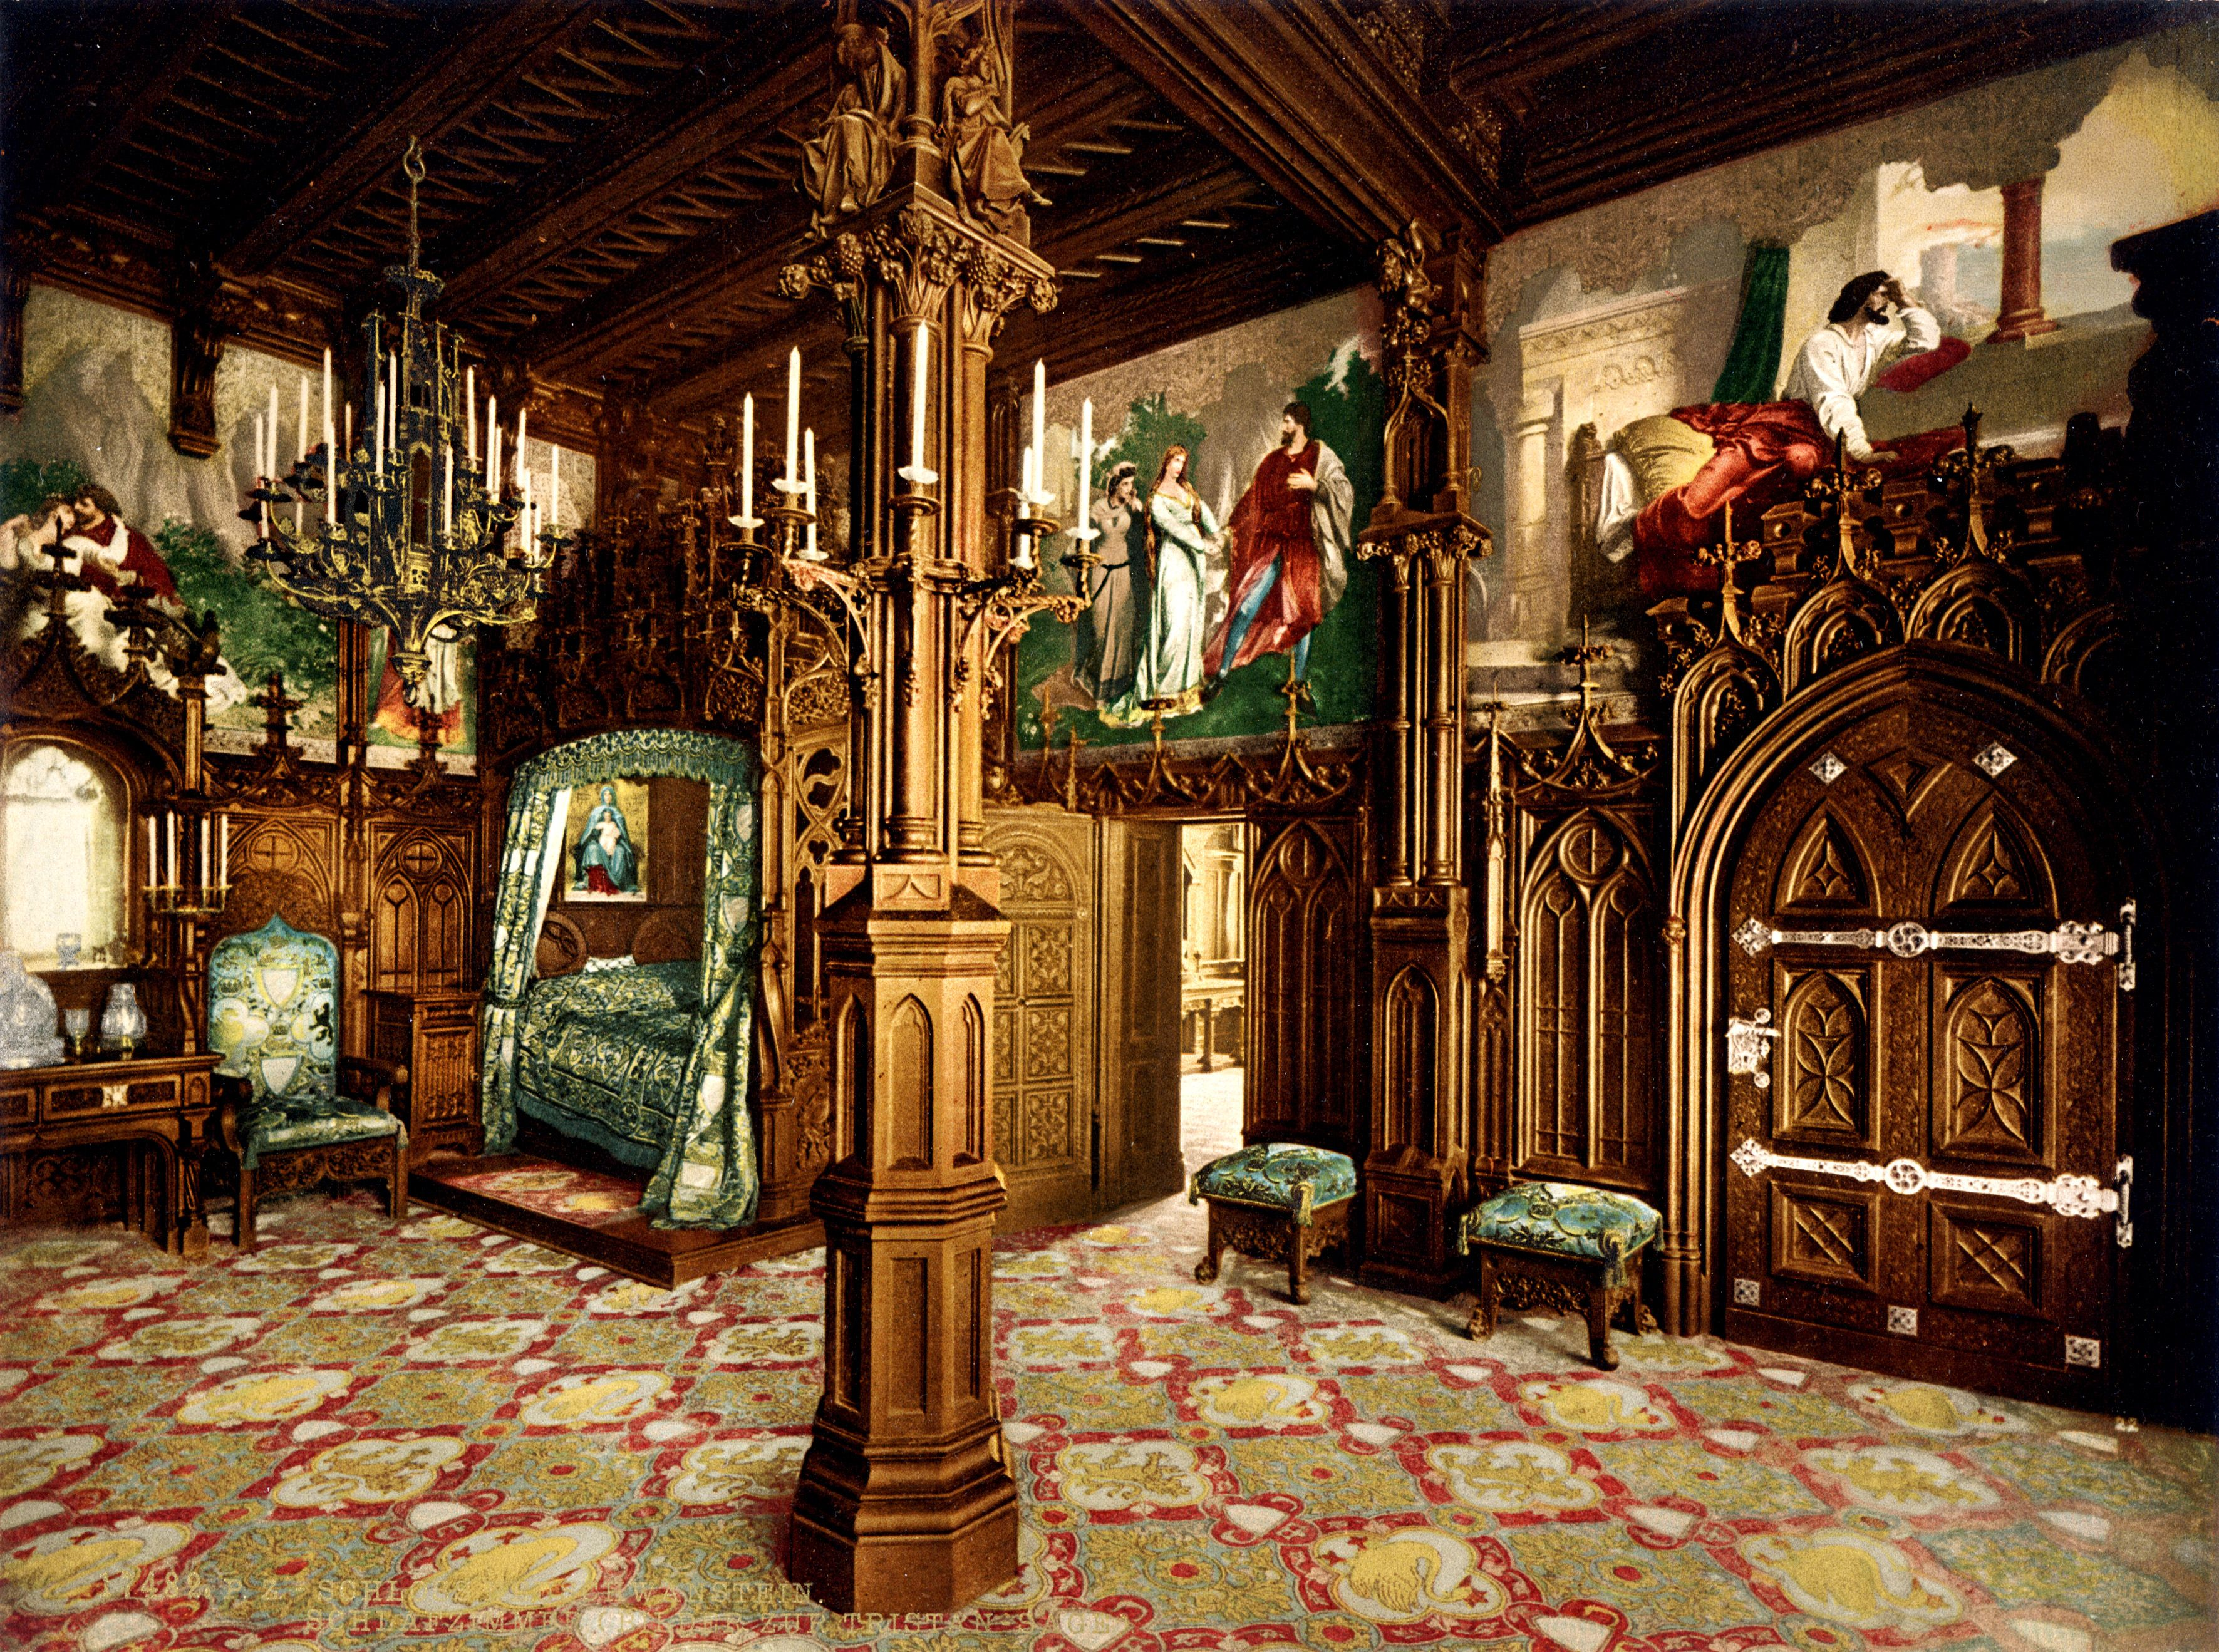 Medieval Bedroom Schloss Hohenschwangau Inside Castles Pinterest Castle